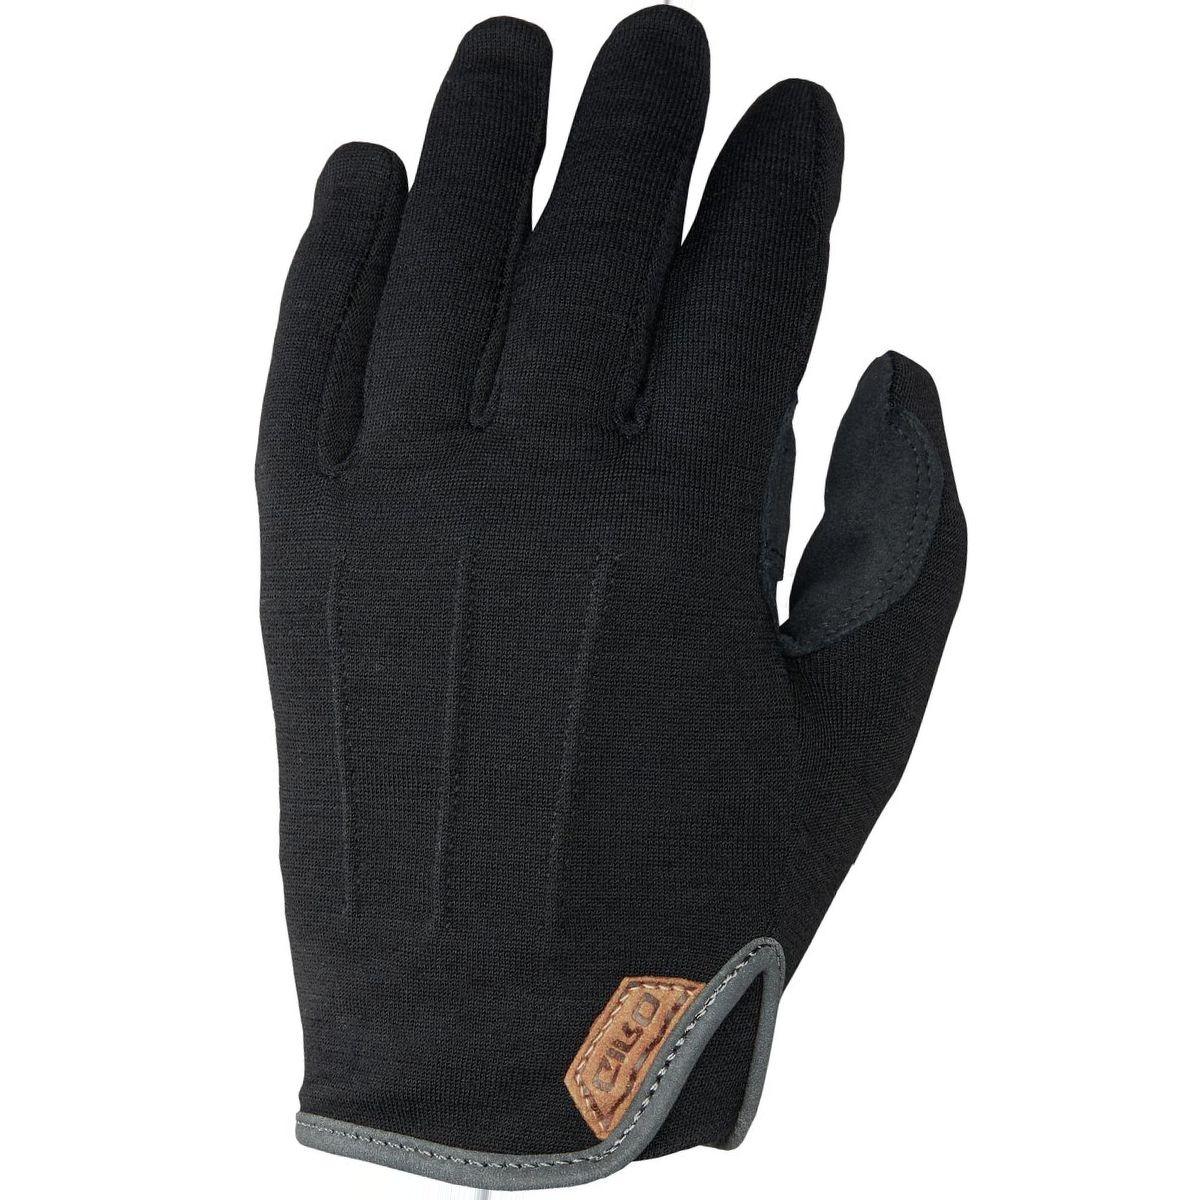 Giro D'Wool Glove - Men's